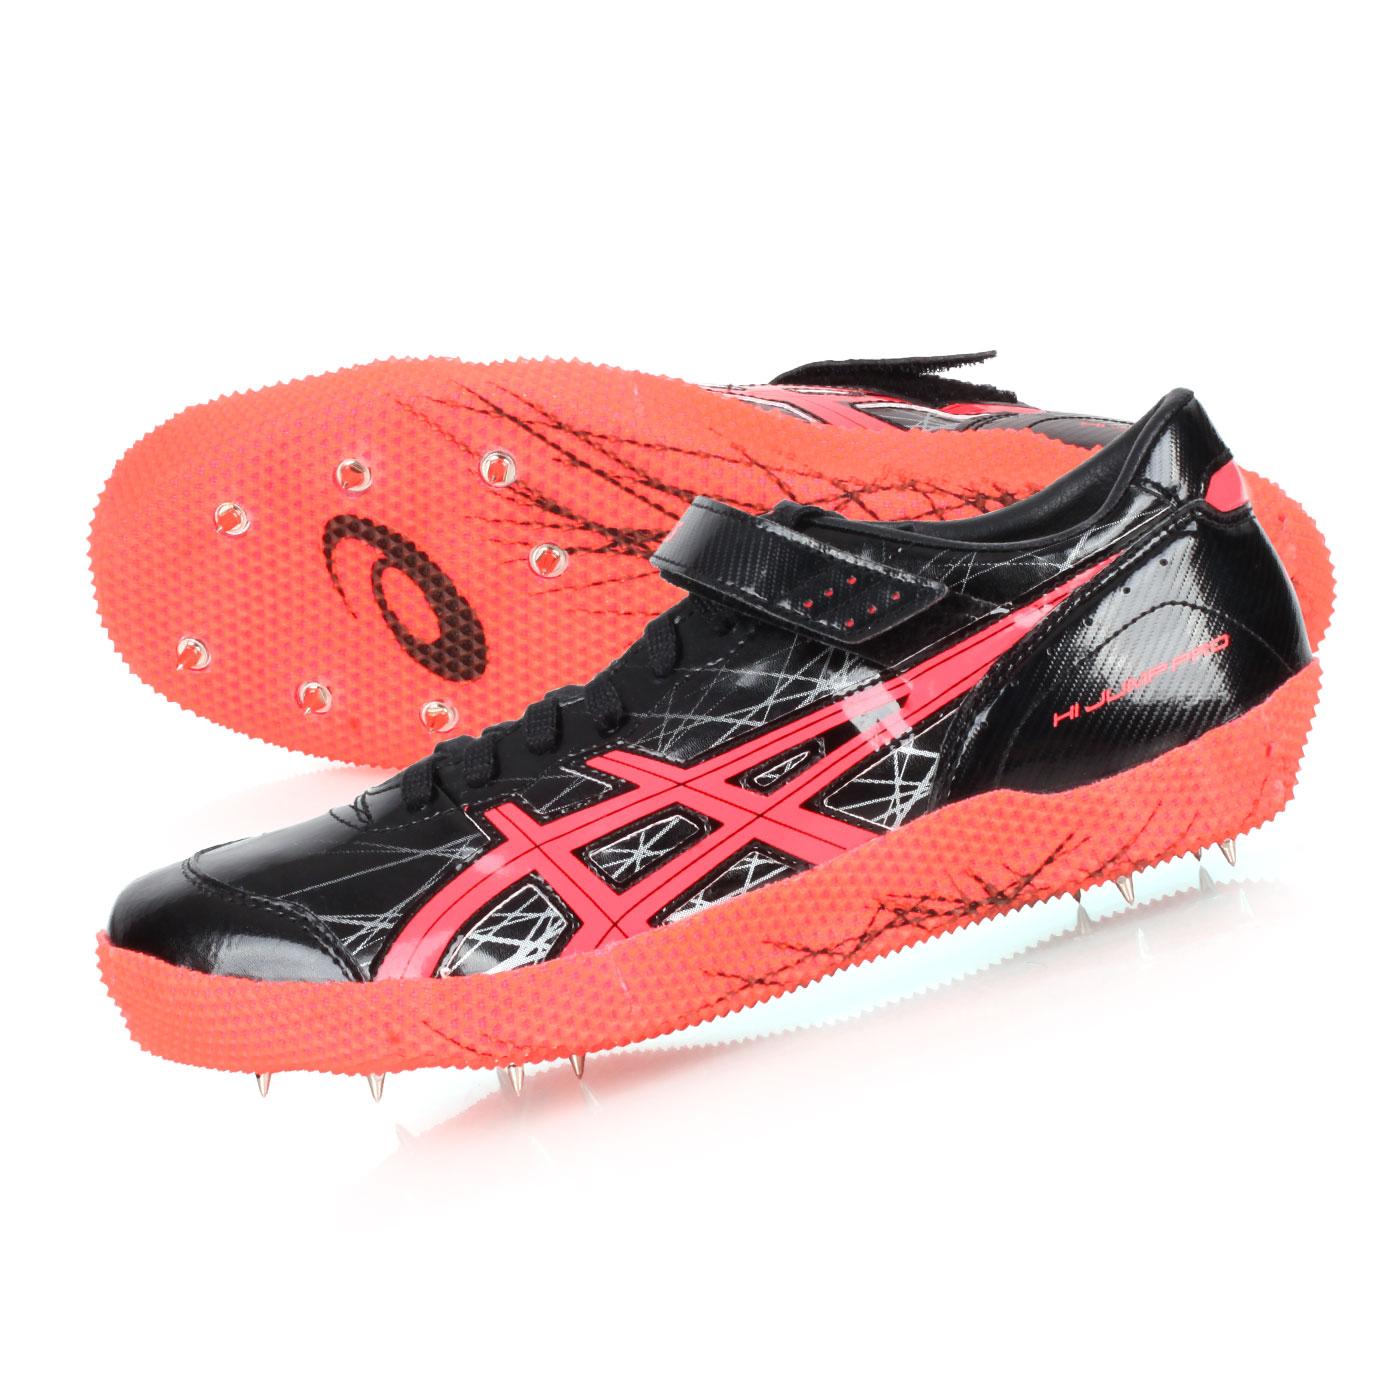 ASICS 田徑釘鞋(跳高左跳)  @HI JUMP PRO(L)@G608Y-9006 - 黑橘